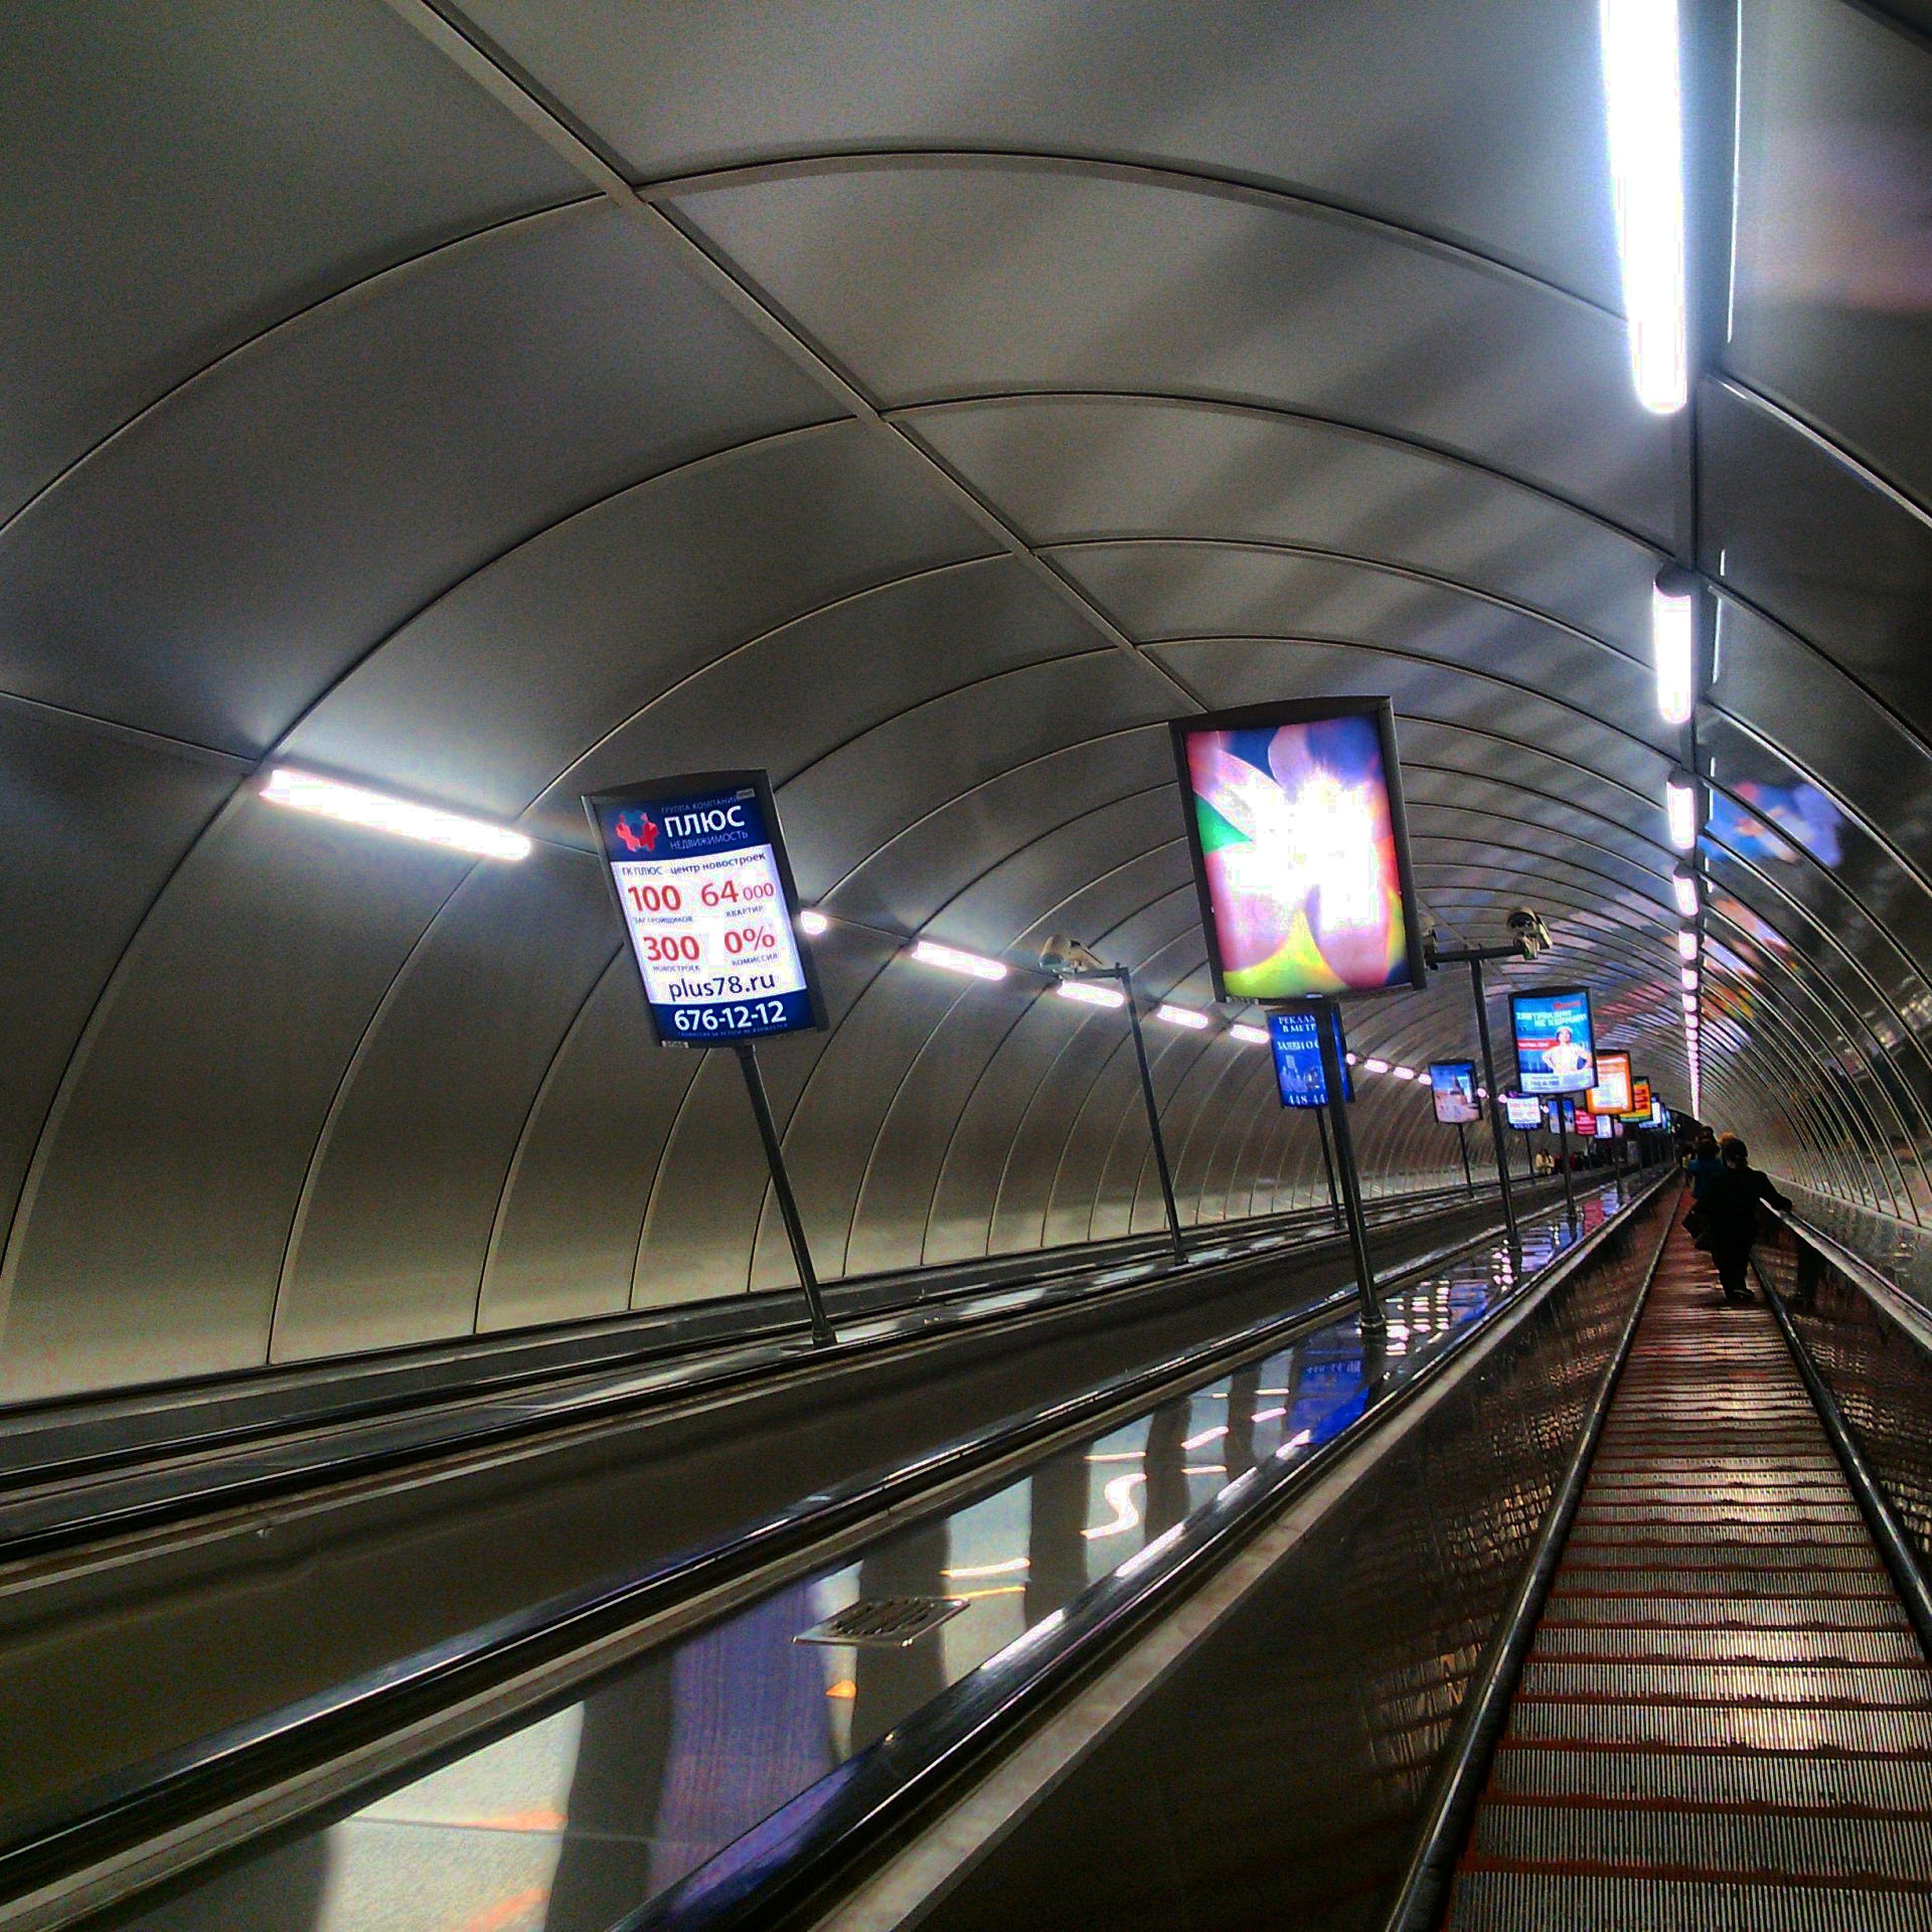 illuminated, transportation, night, no people, indoors